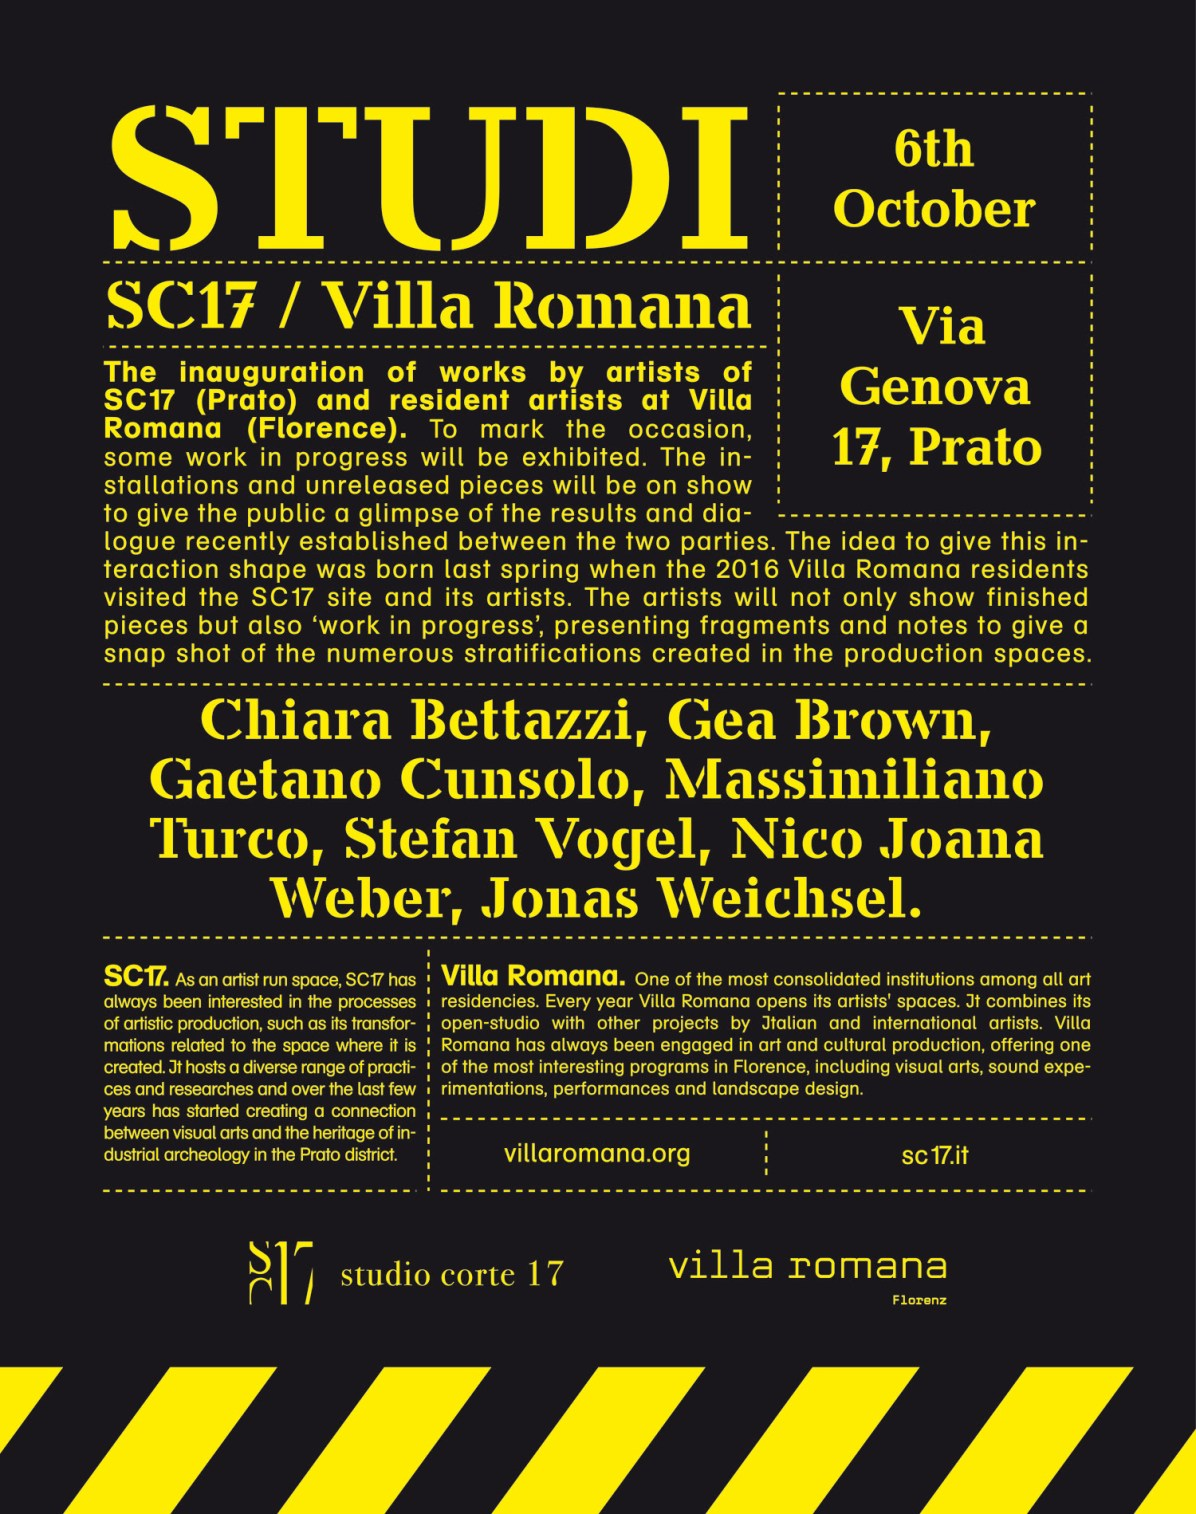 STUDI - SC17 / Villa Romana